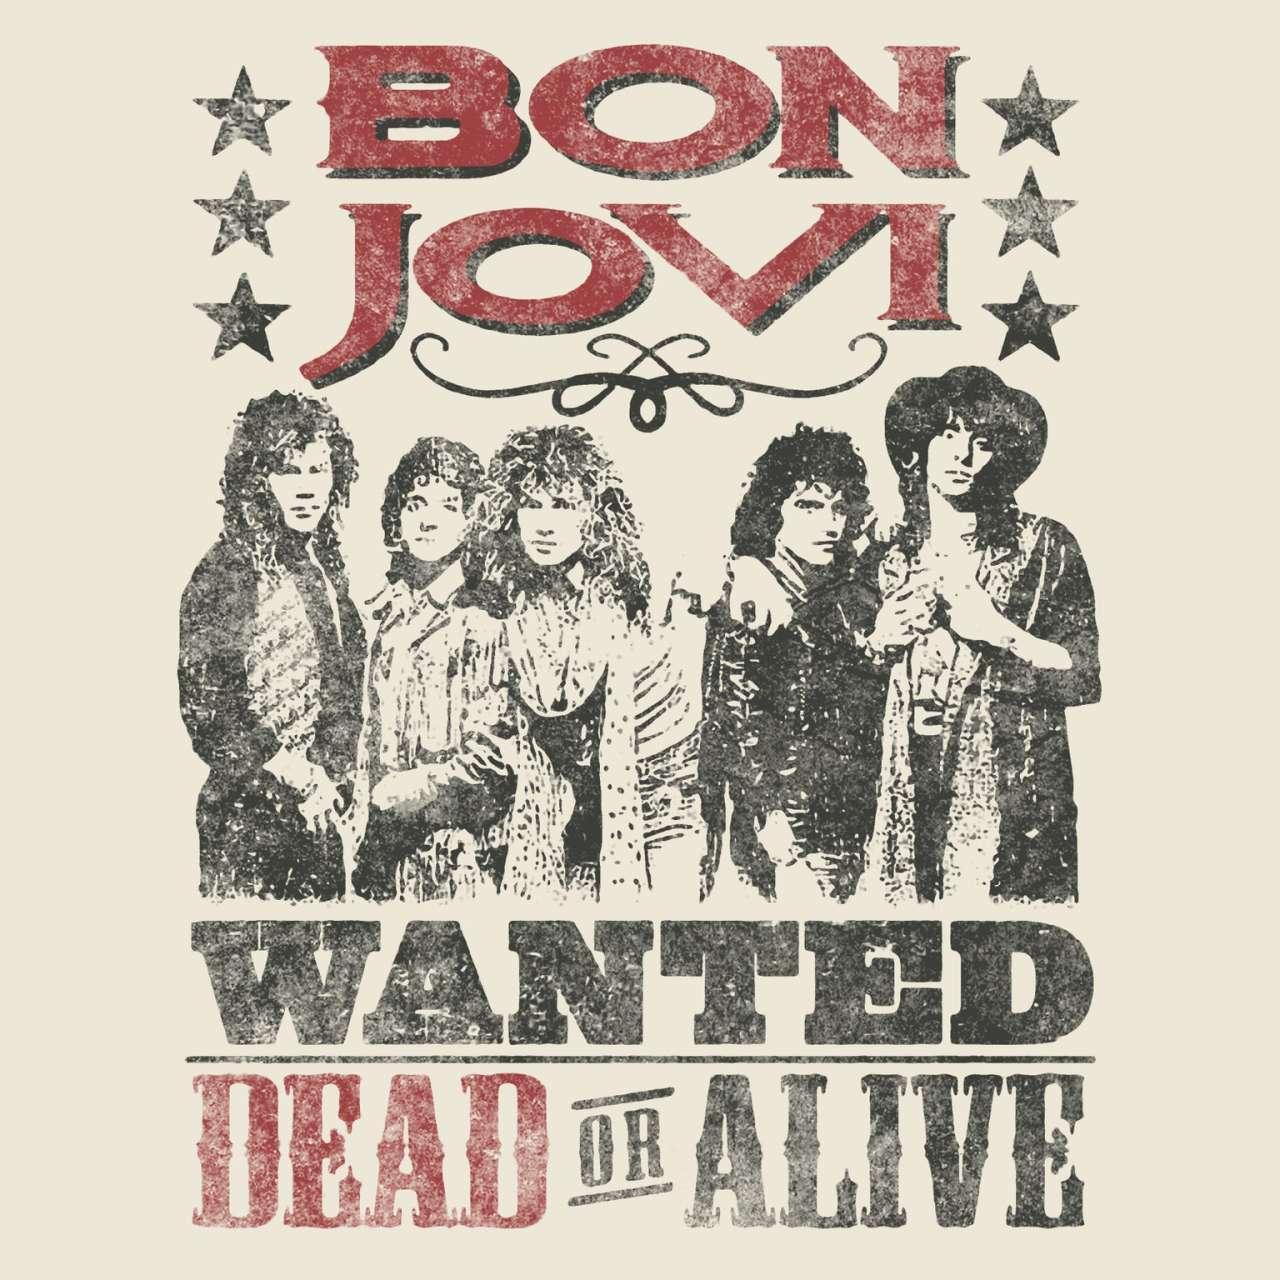 bon jovi t shirt wanted dead or alive poster bon jovi shirt